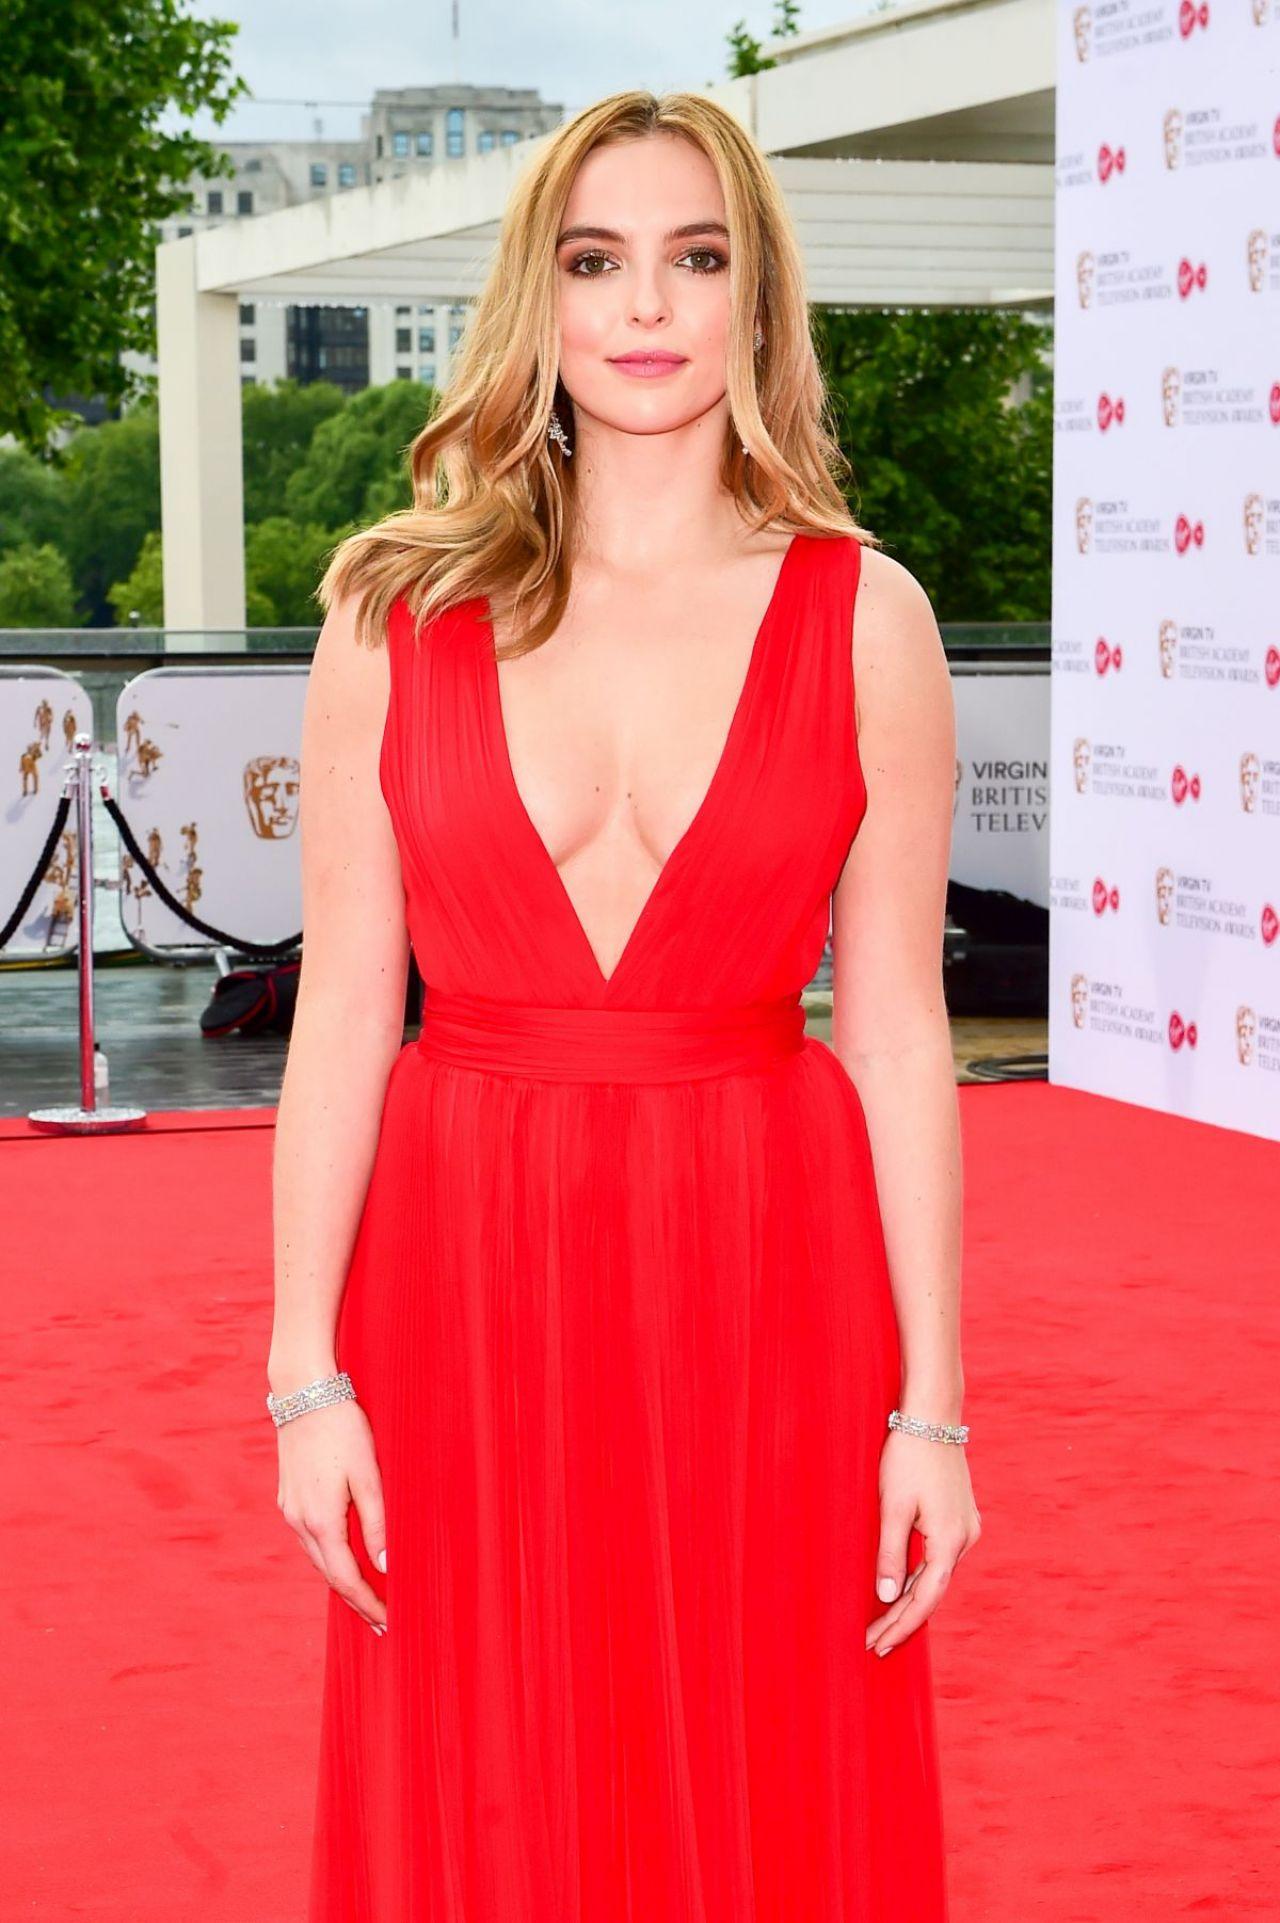 Jodie Comer Bafta Television Awards In London 05 14 2017